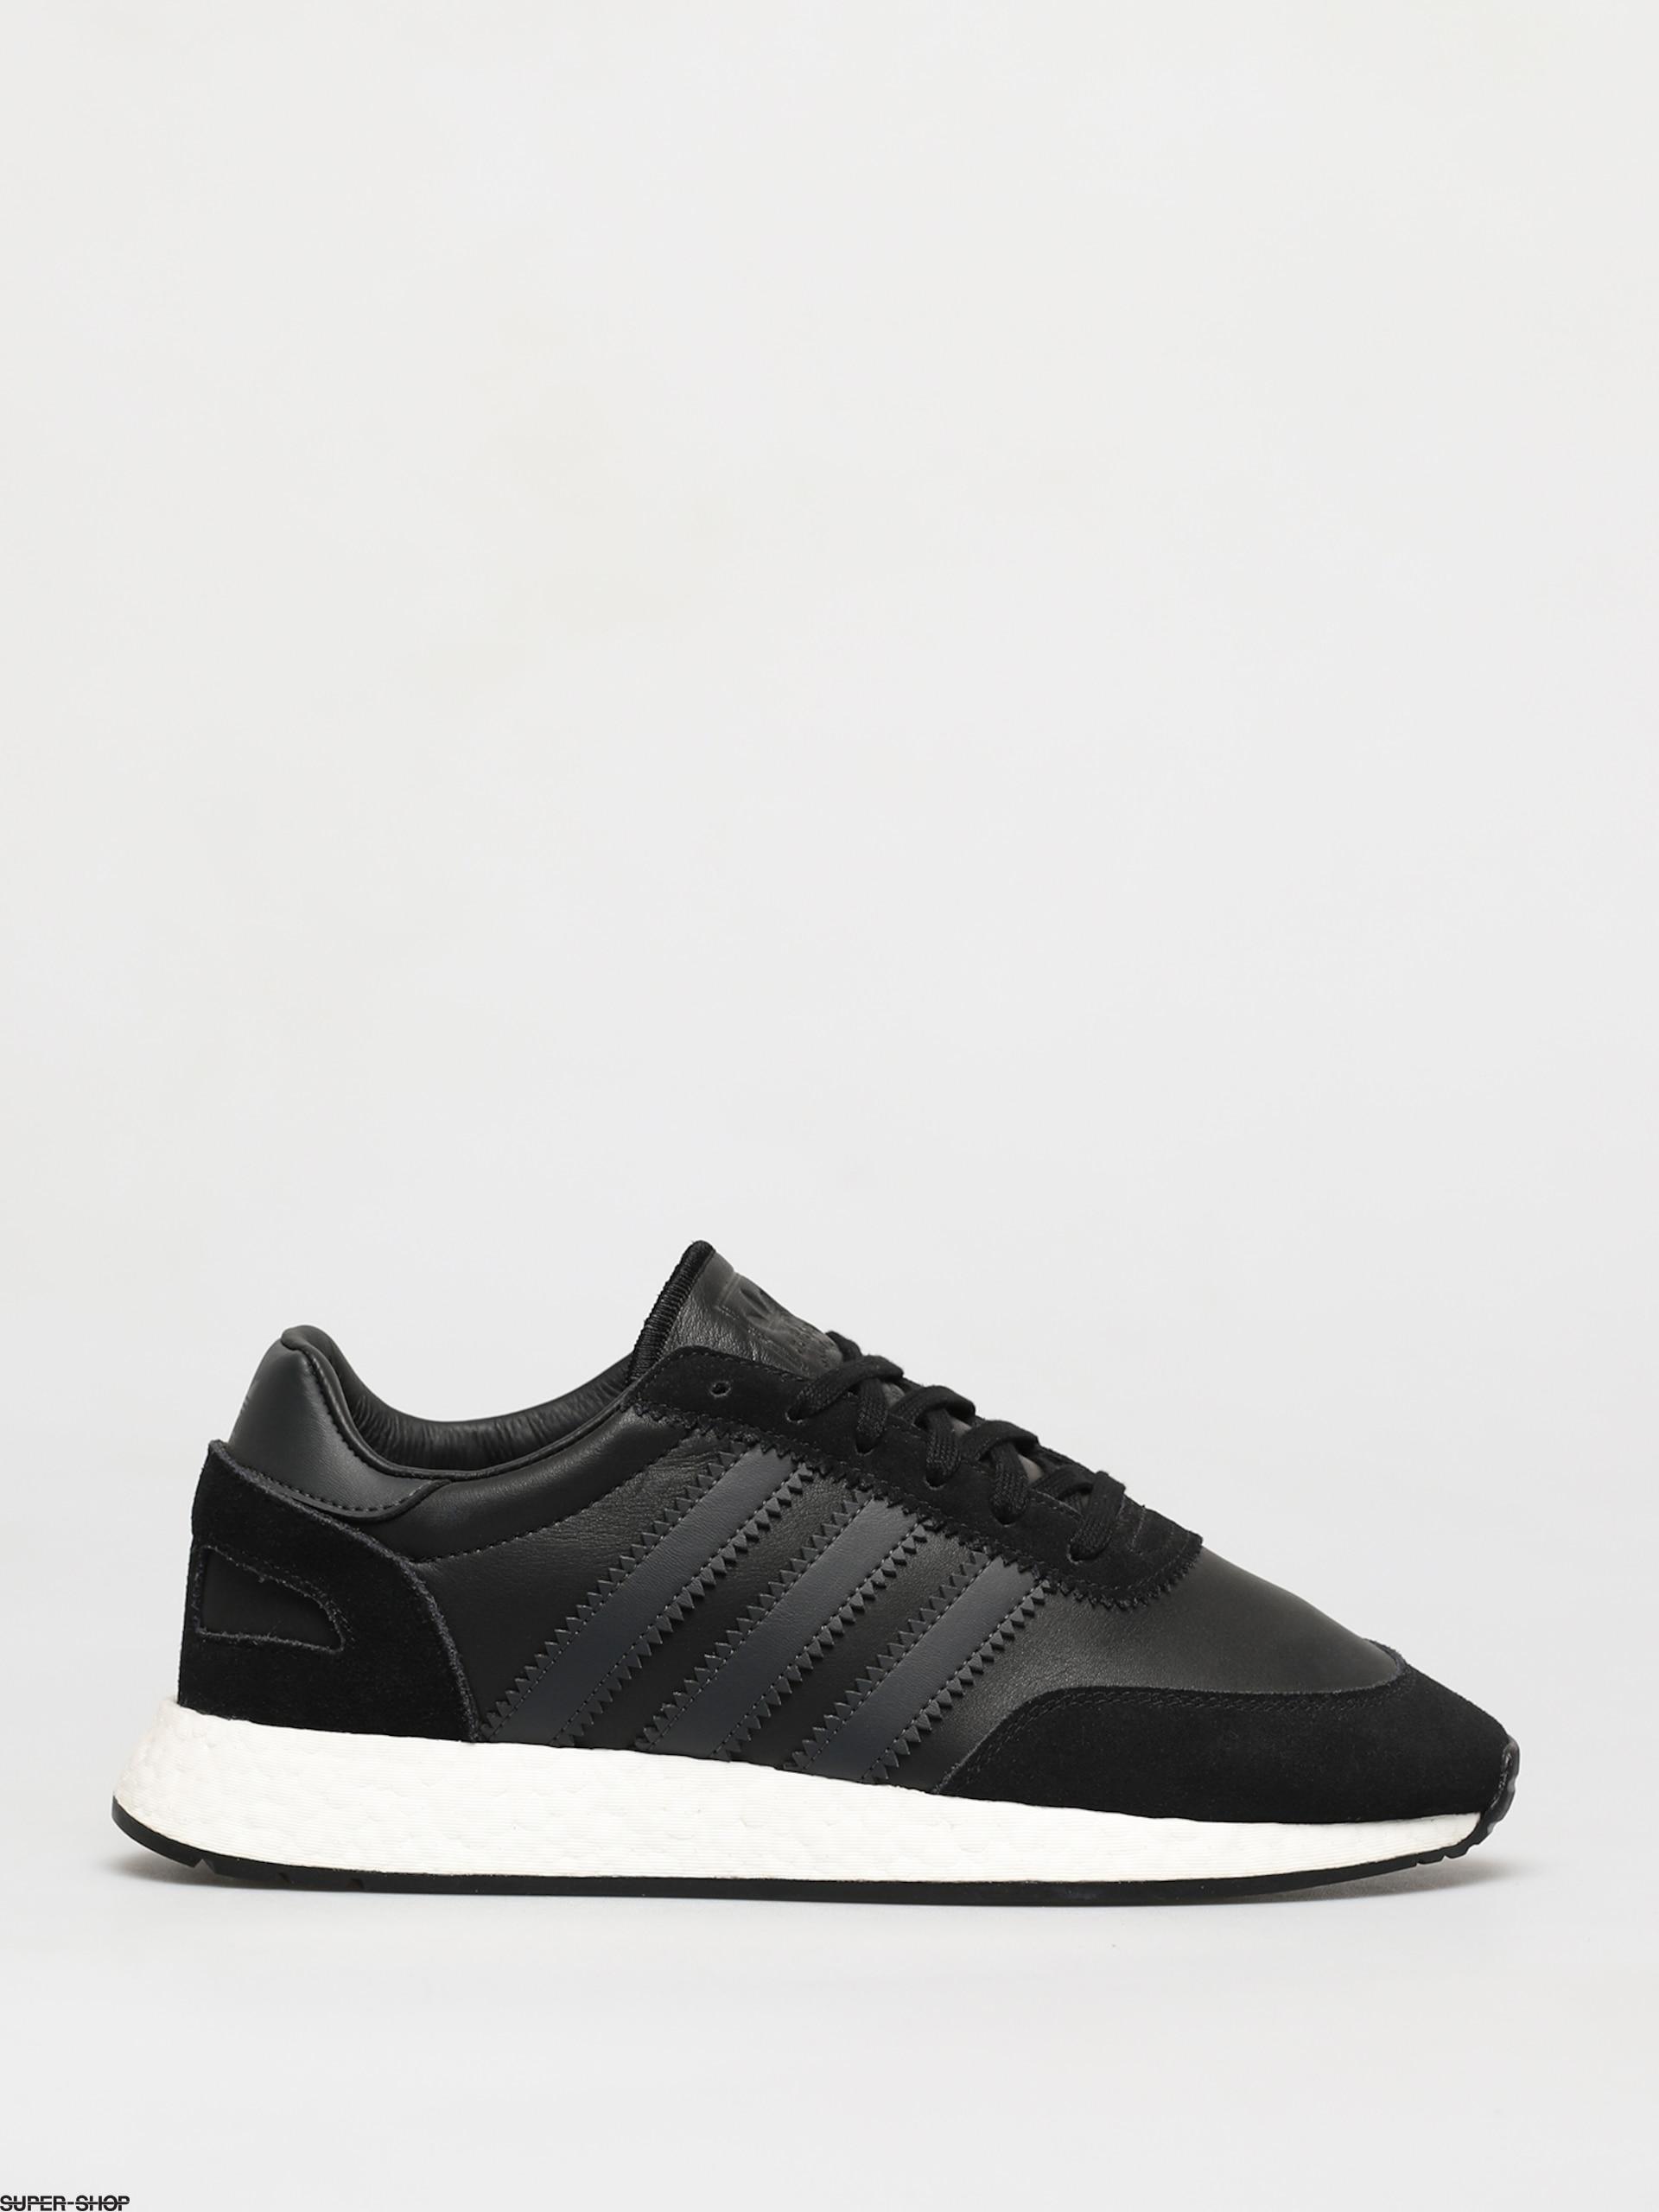 adidas Originals I 5923 Shoes (cblack/carbon/ftwwht)